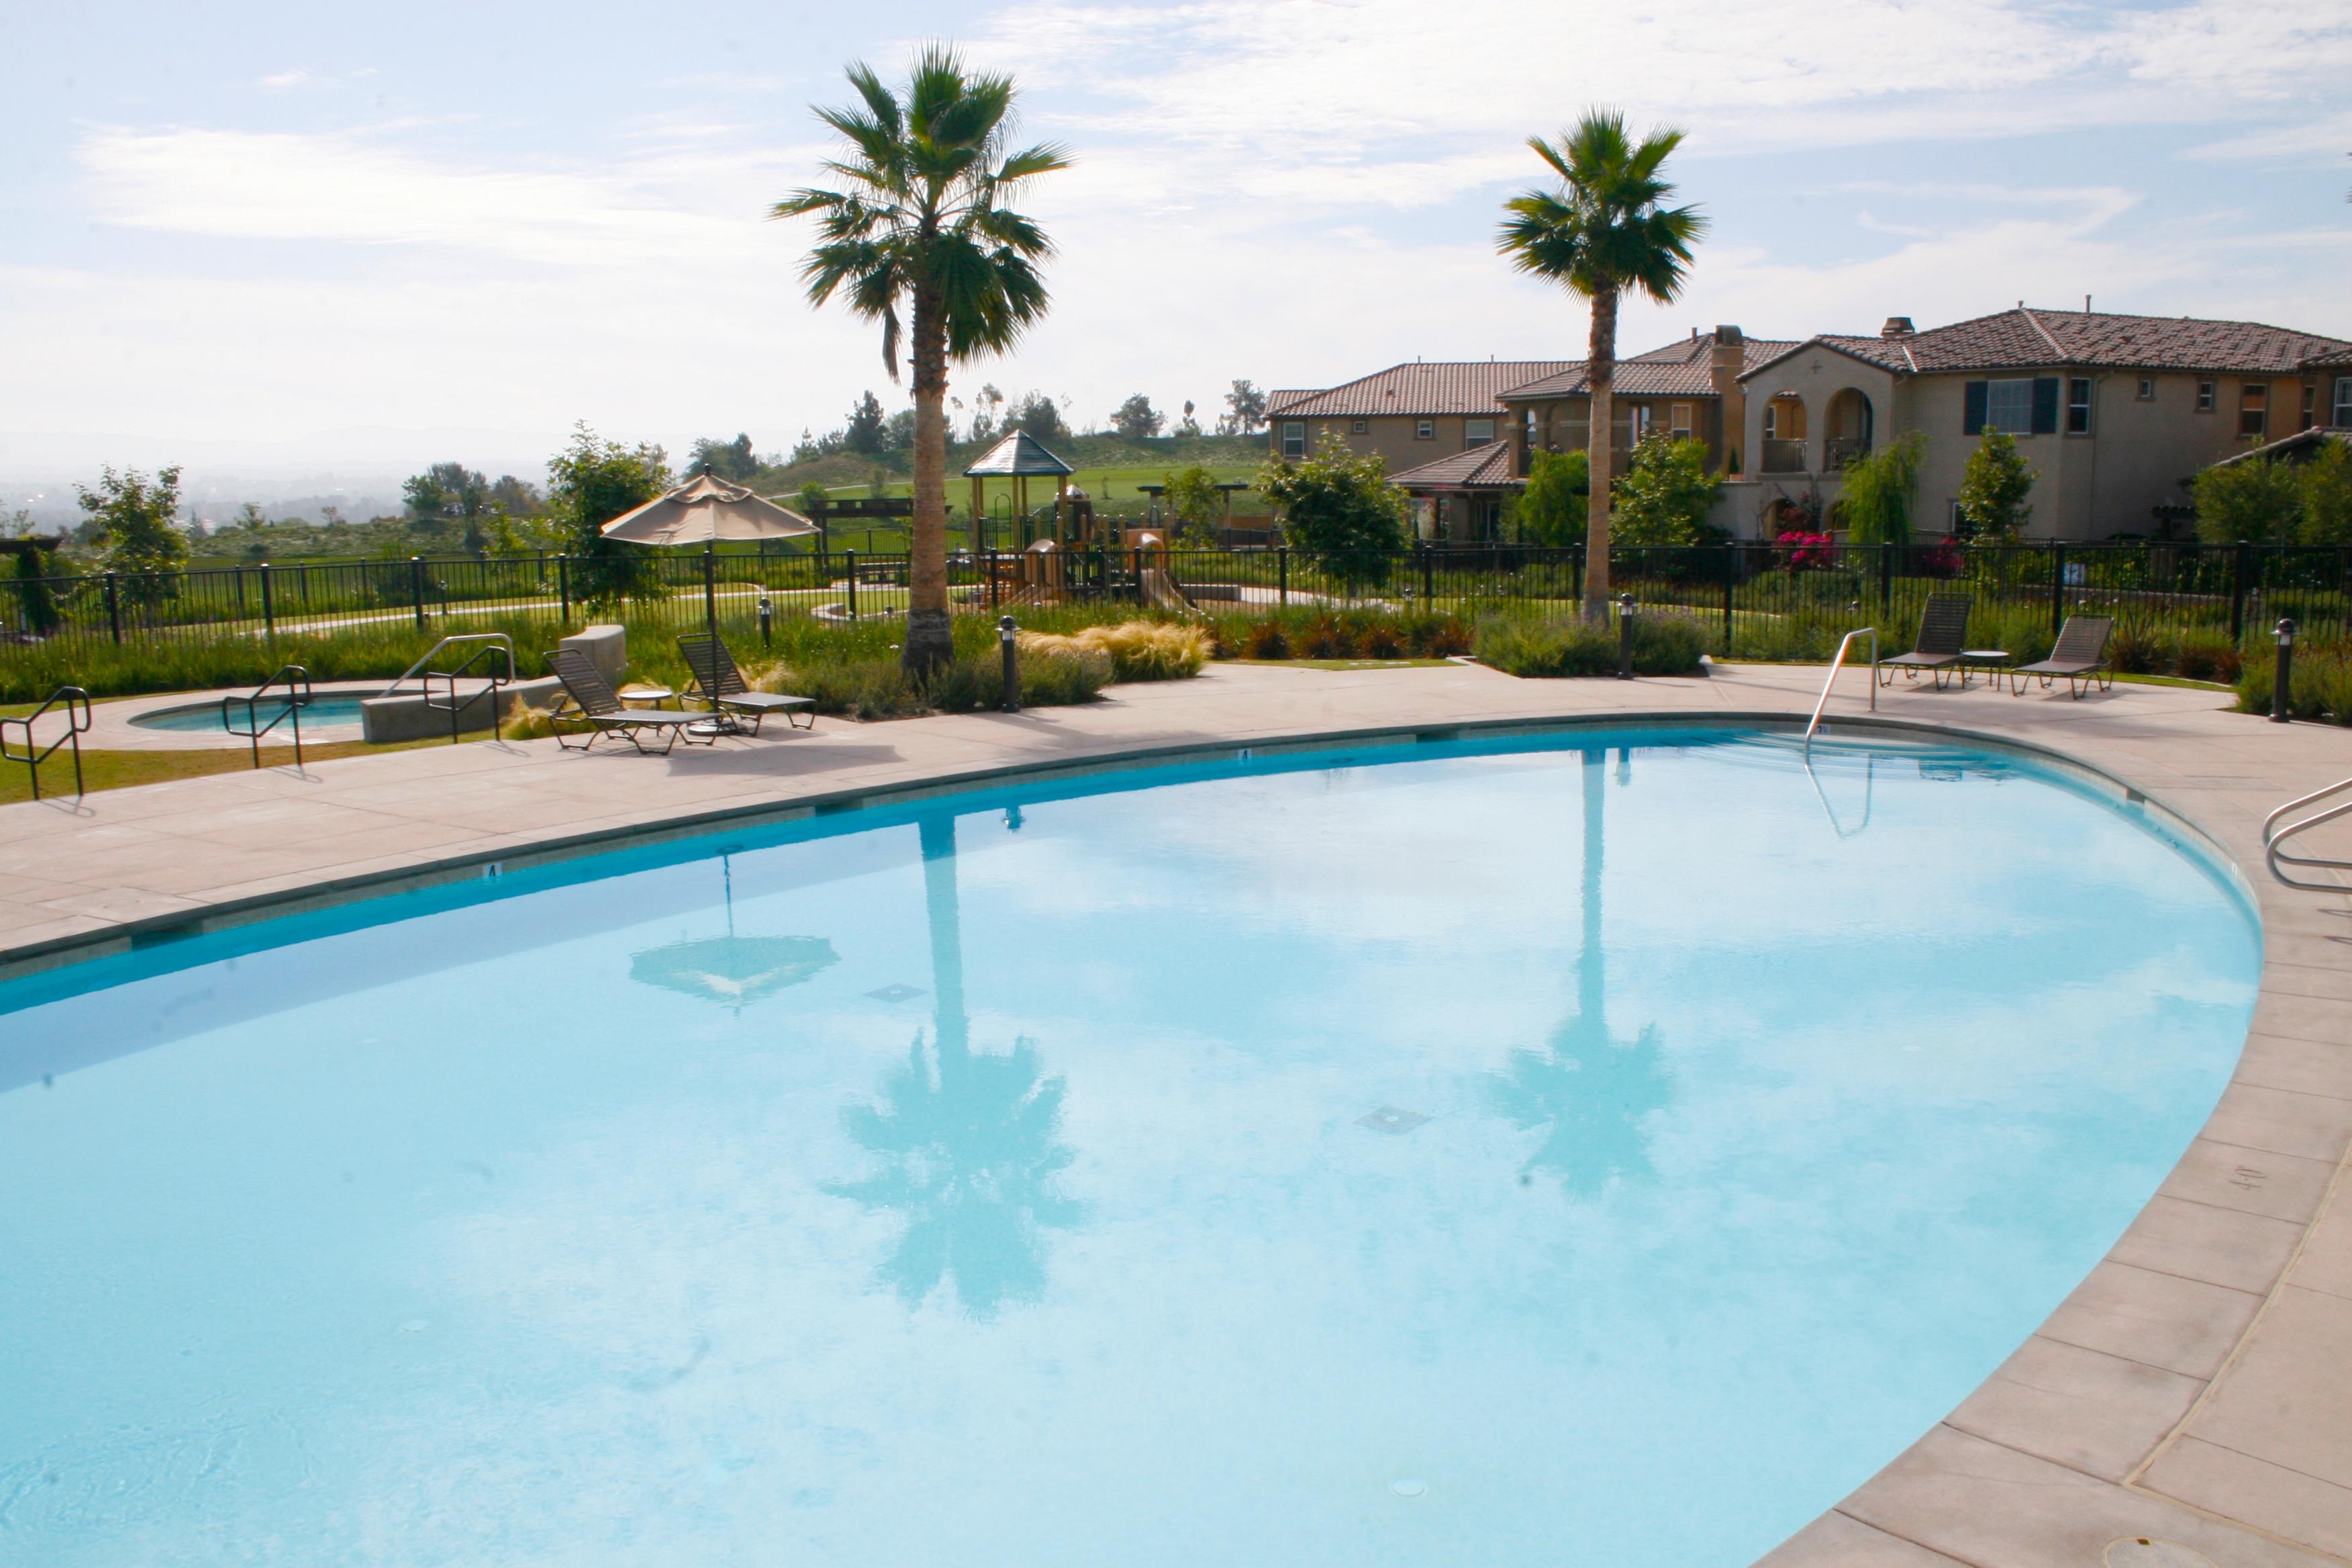 Aliso Viejo Aquatics center pool and building